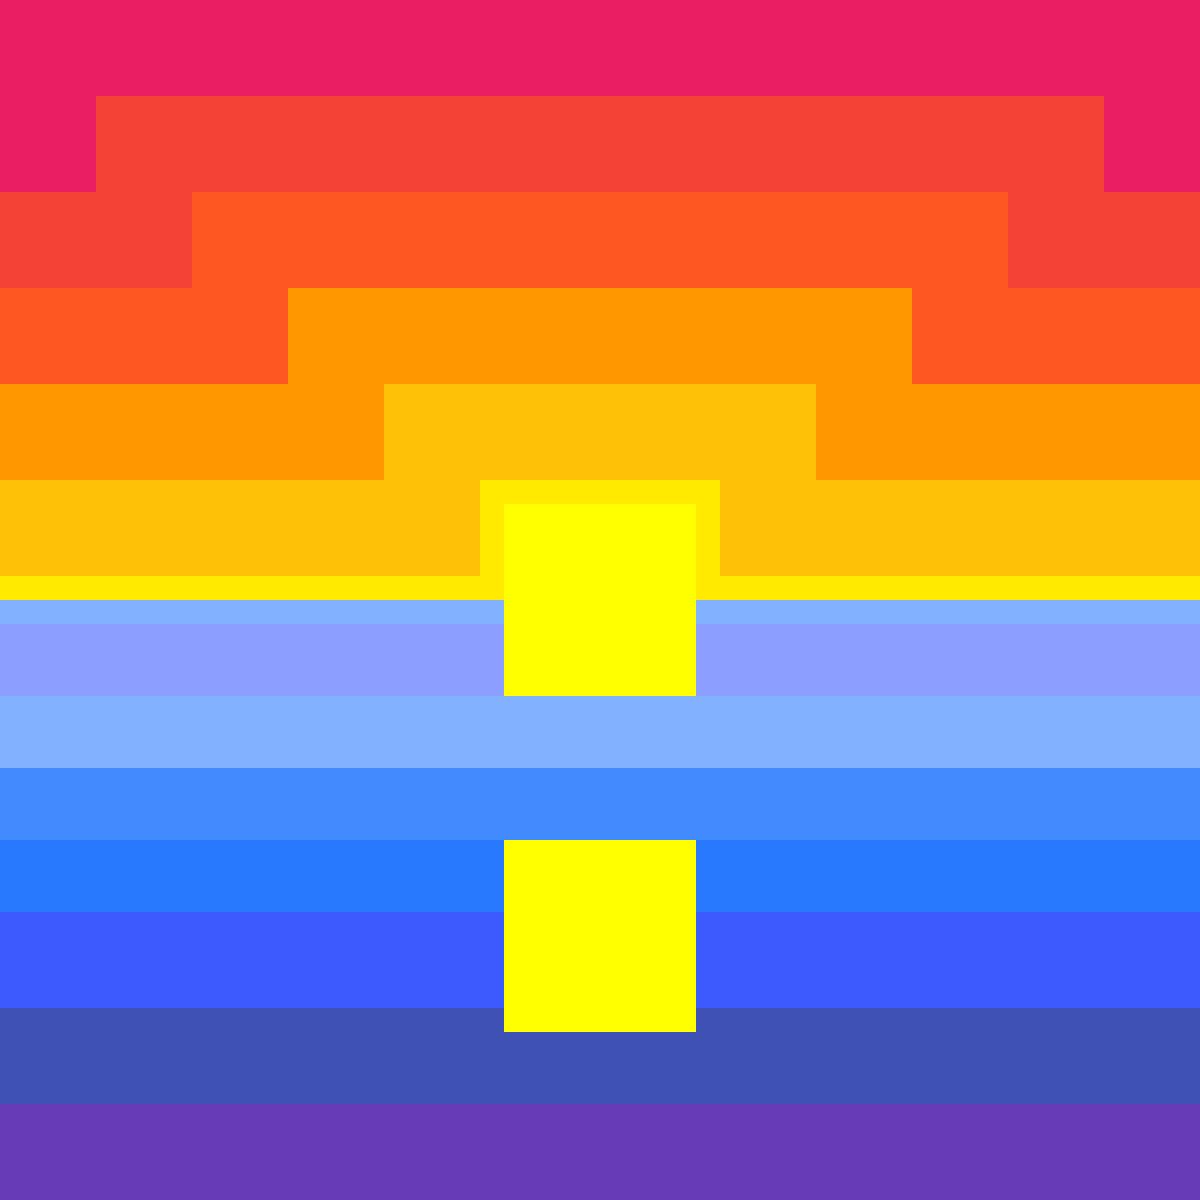 Sunset by Pixelartist9